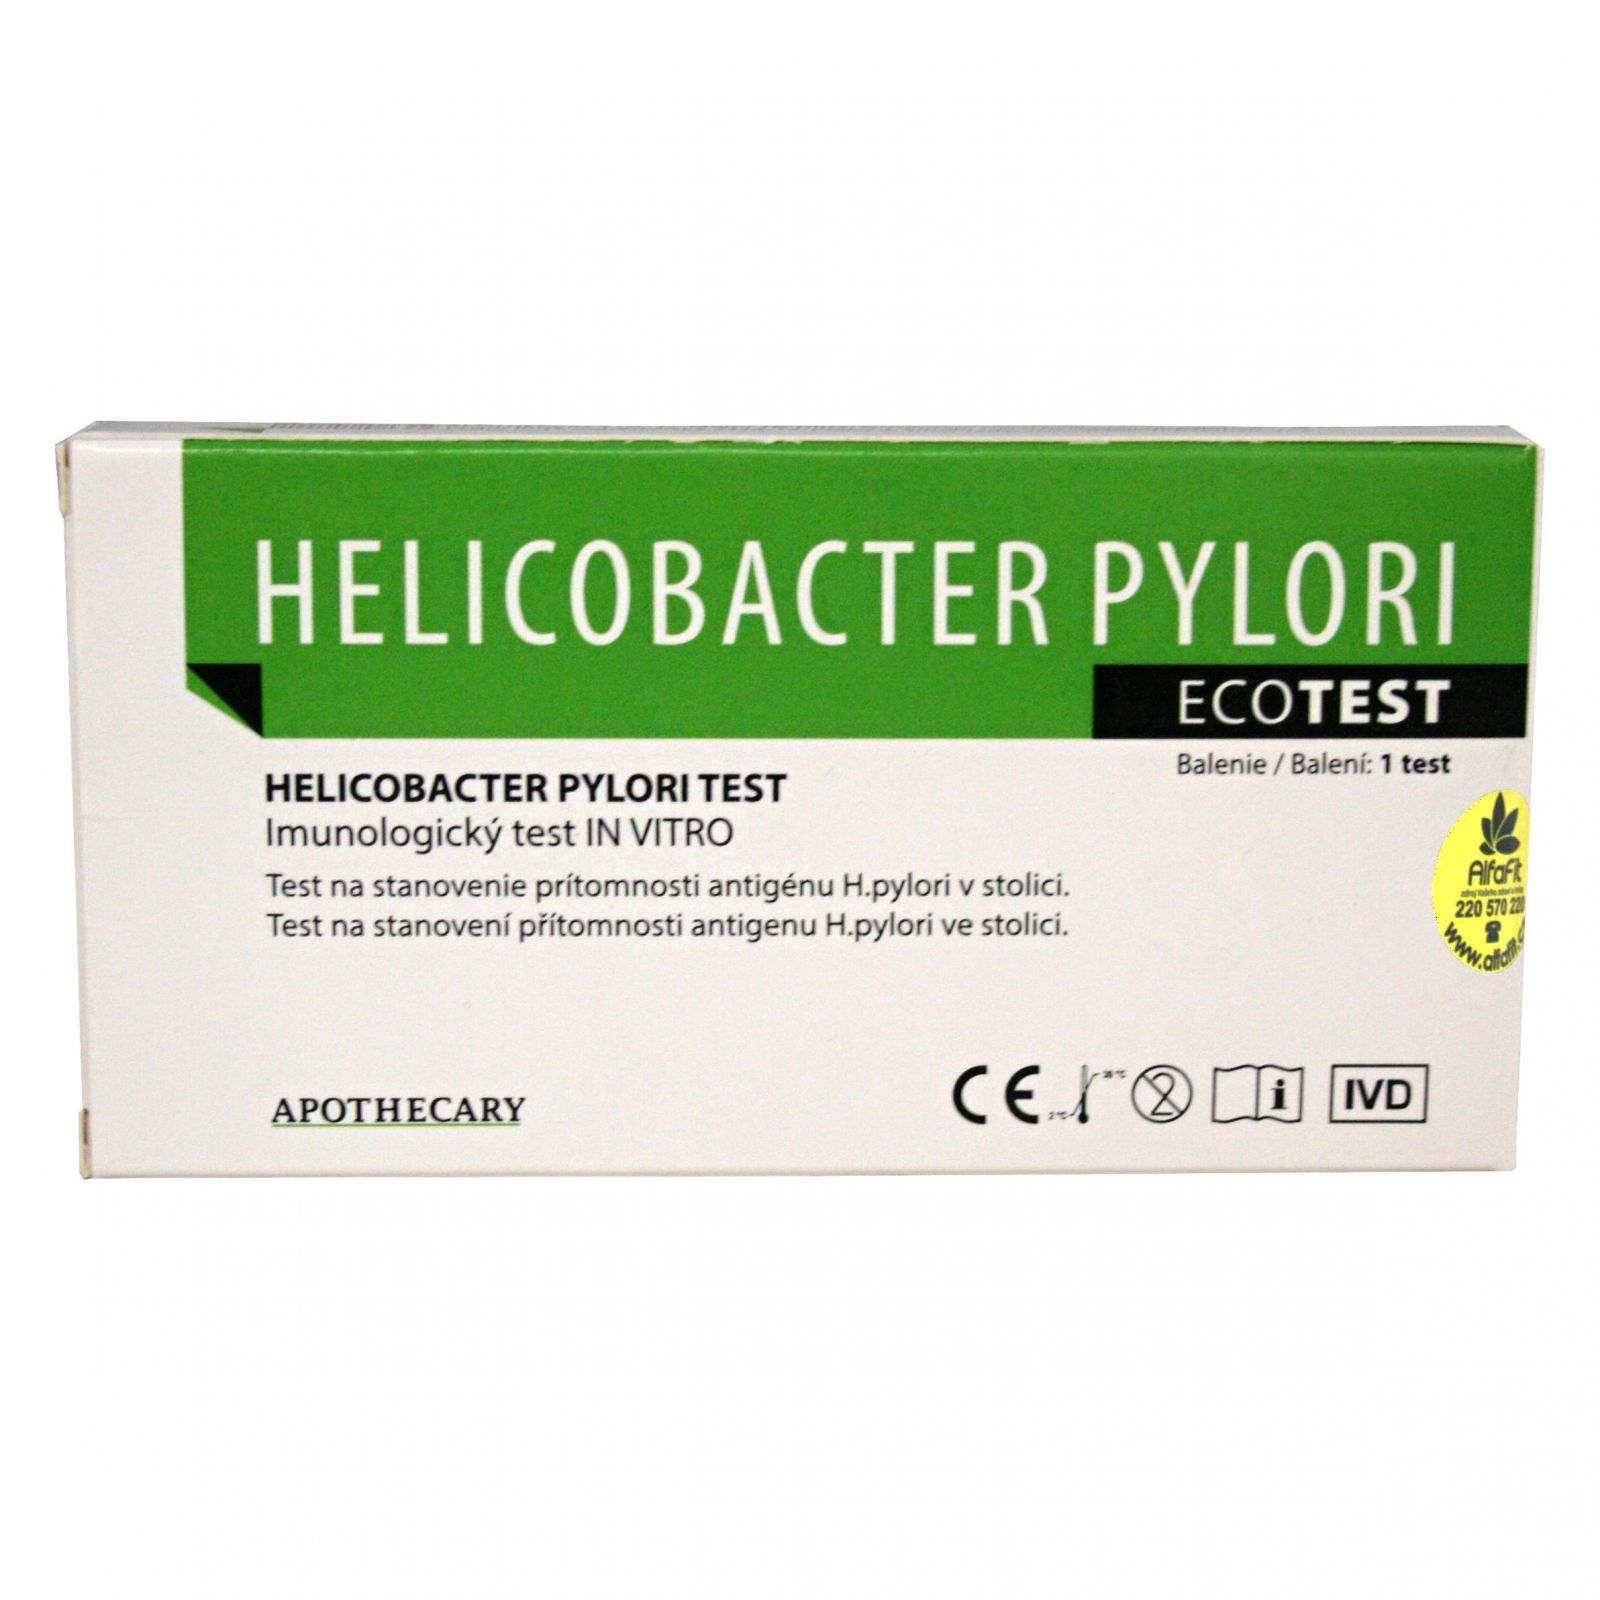 Helicobacter Pylori ecotest